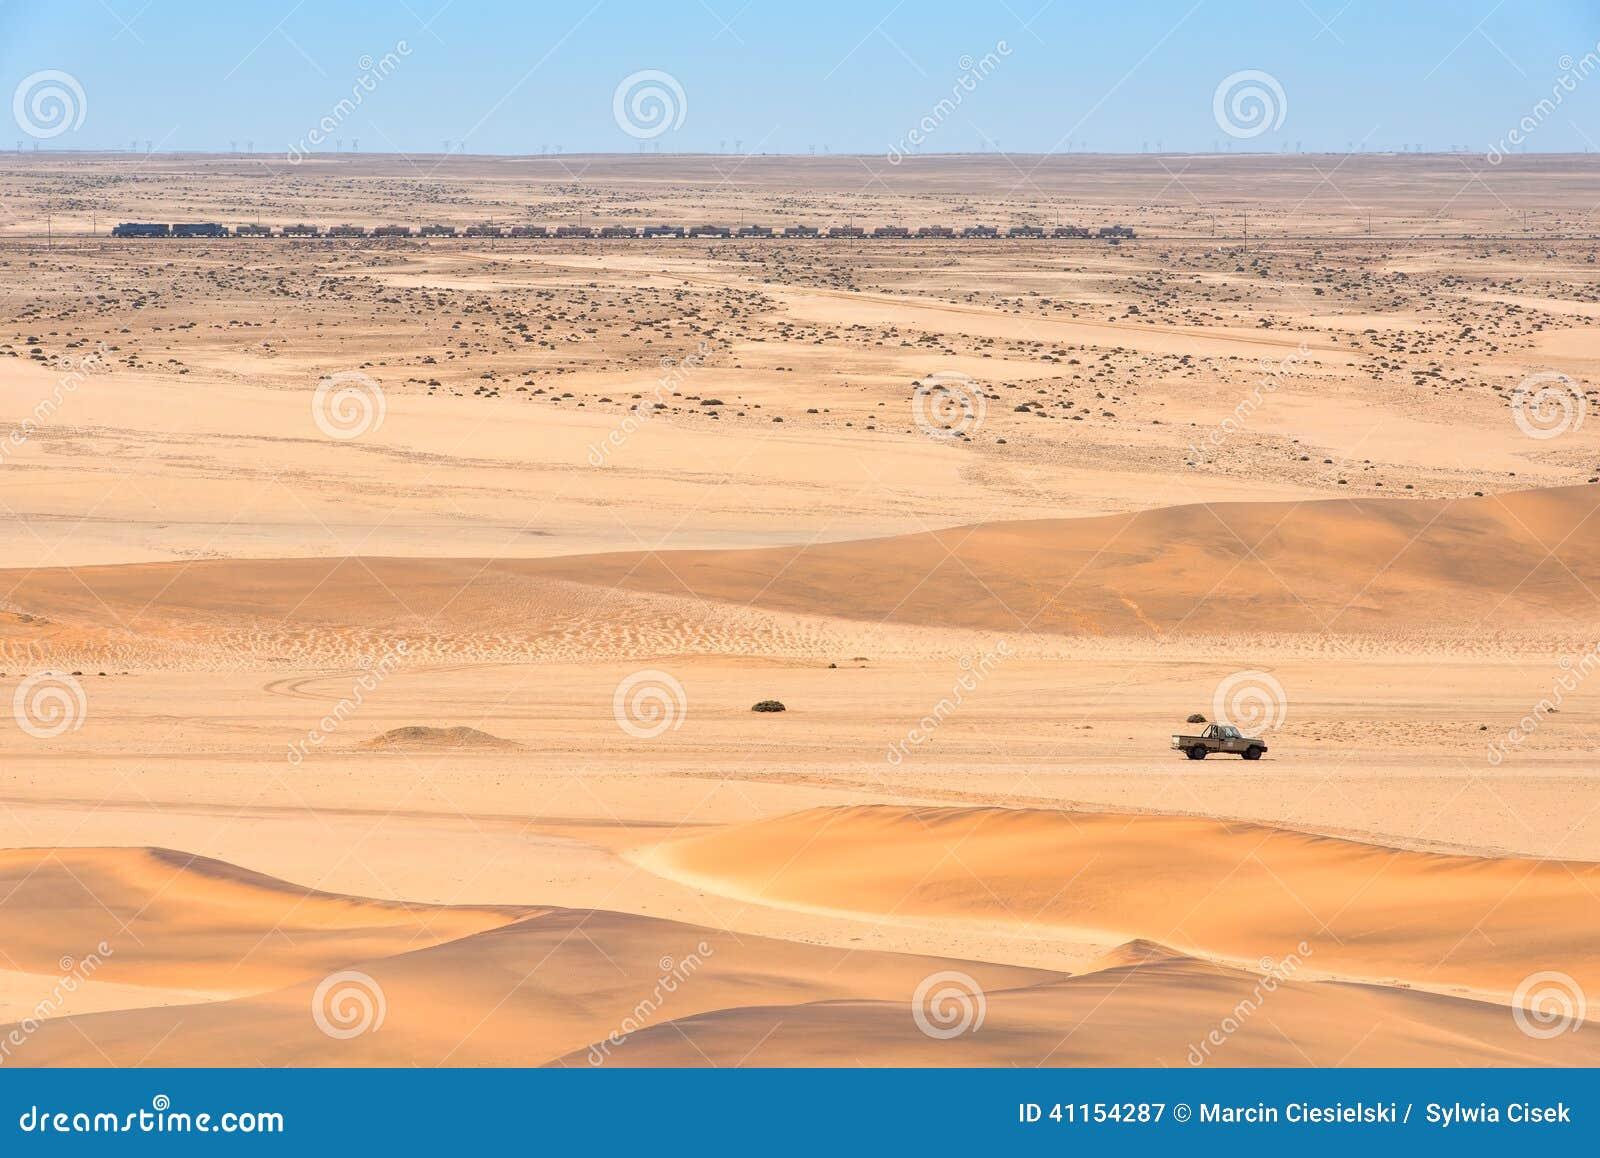 train et voiture dans le d sert en namibie photo stock image 41154287. Black Bedroom Furniture Sets. Home Design Ideas